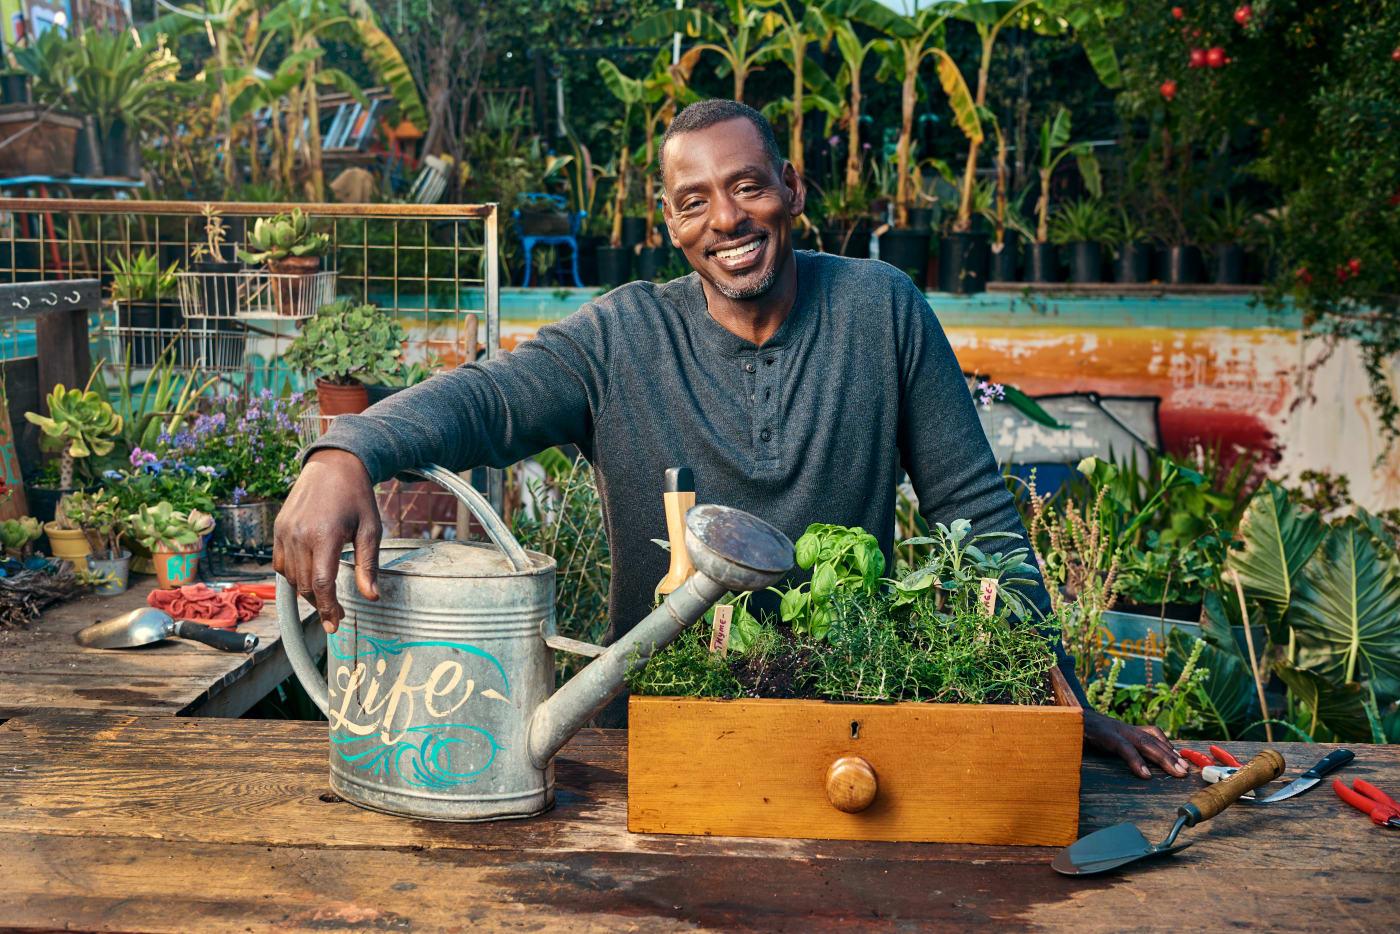 ron finley gardening with attitude masterclass complex interview